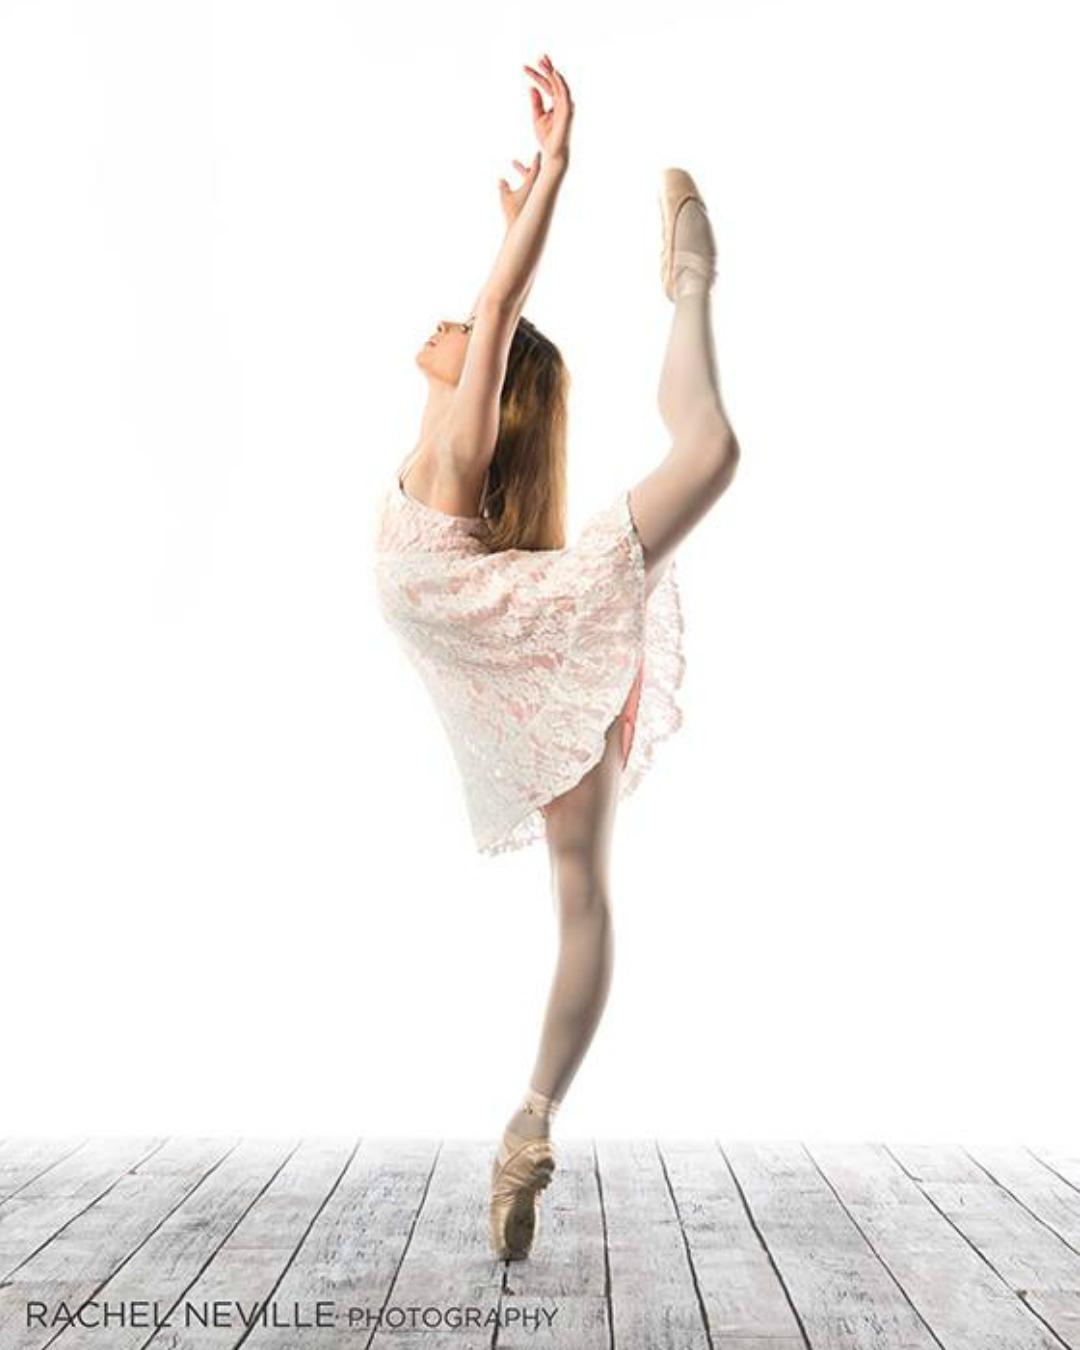 Ballerina-Juliette-Bosco-Ellison-Ballet-Photo-by-Rachel-Neville-Photography-wallpaper-wp423902